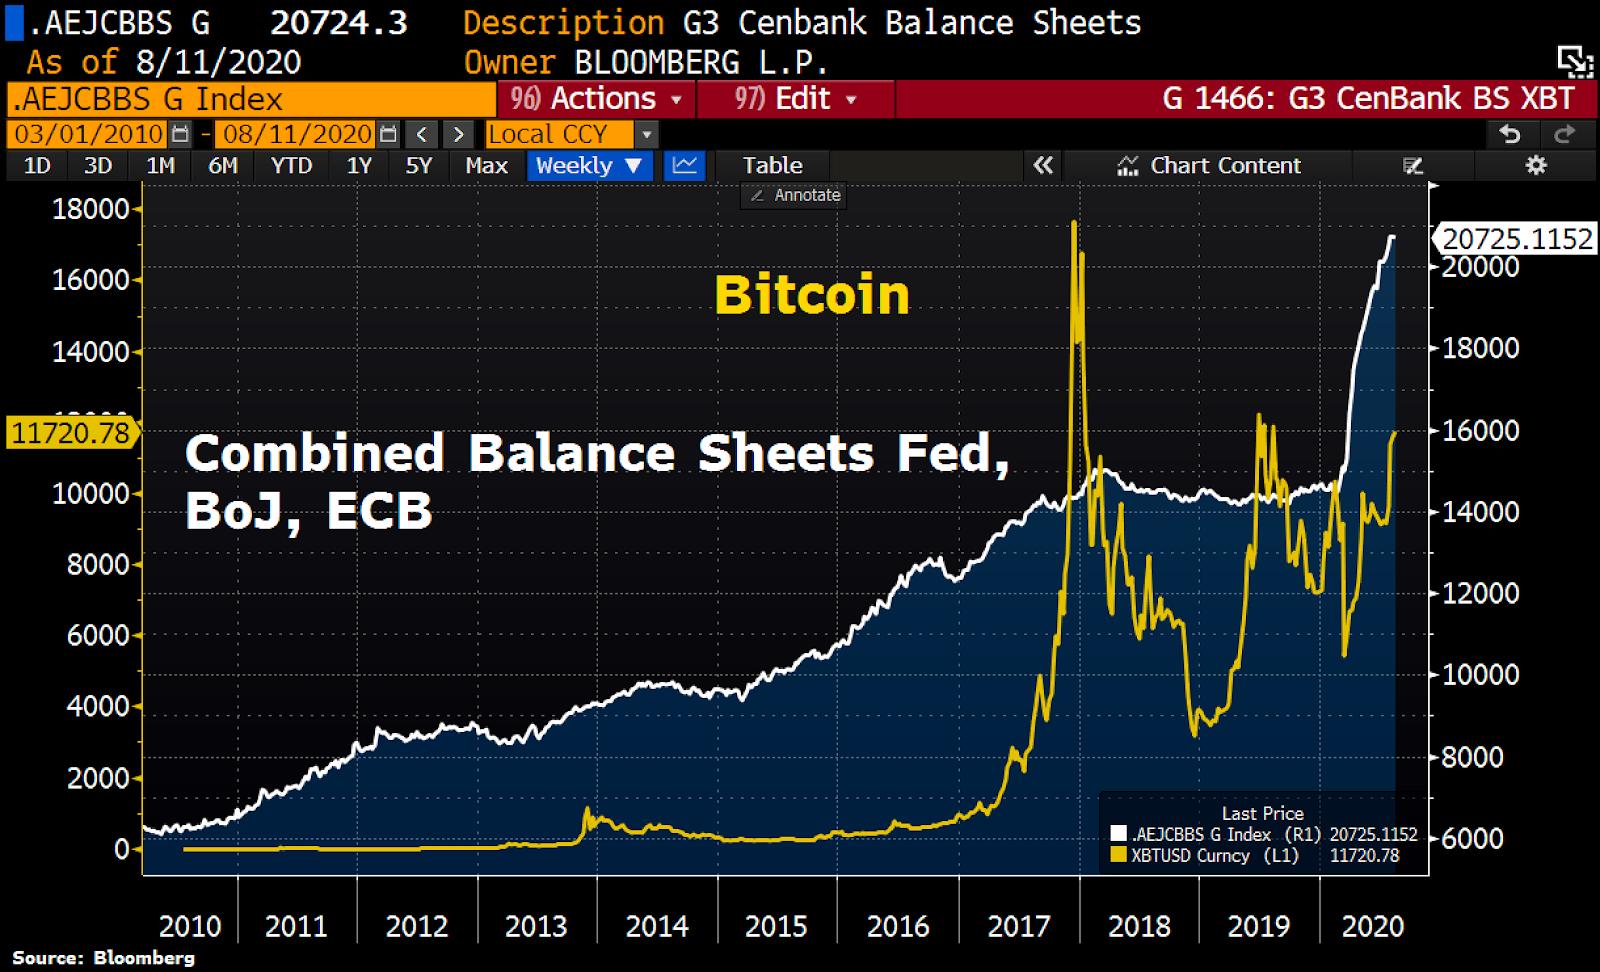 Central banks' balance sheet versus BTC/USD